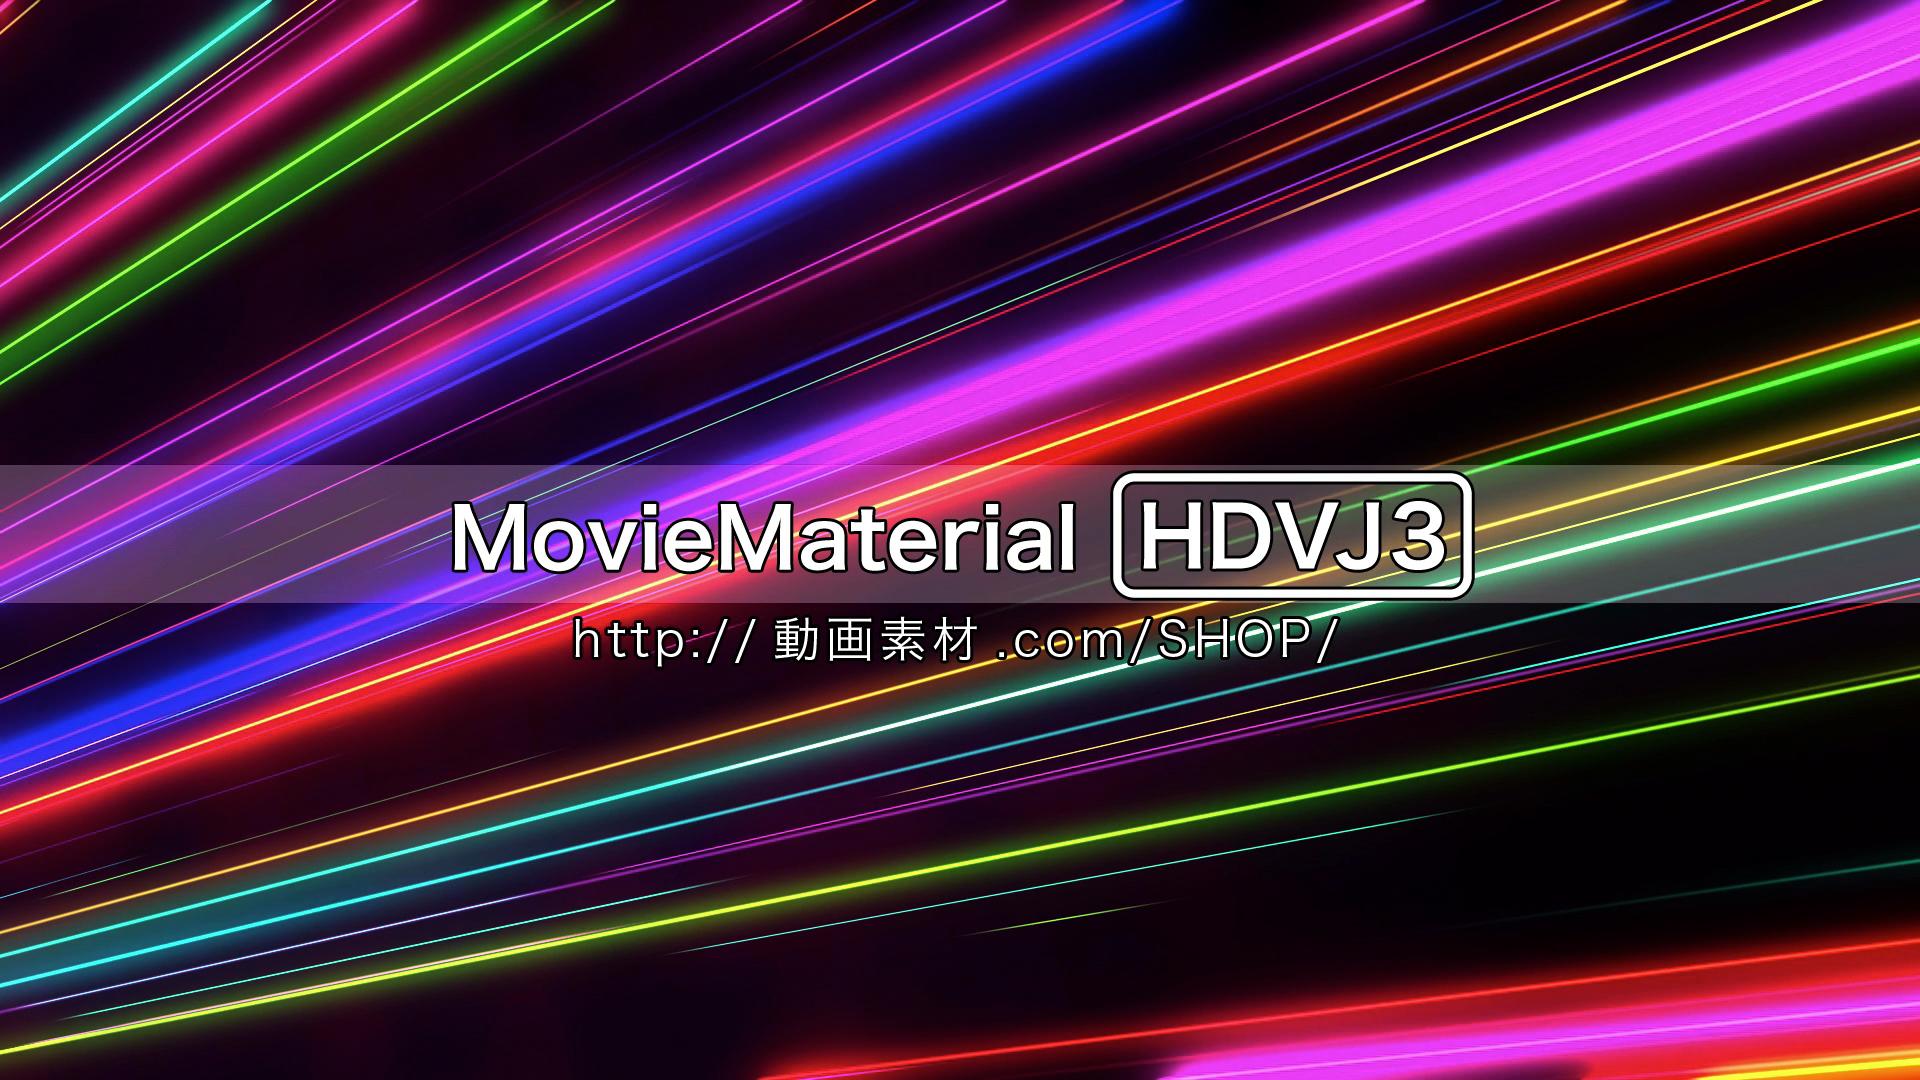 MovieMaterial HDVJ3 フルハイビジョンVJ動画素材集 画像8